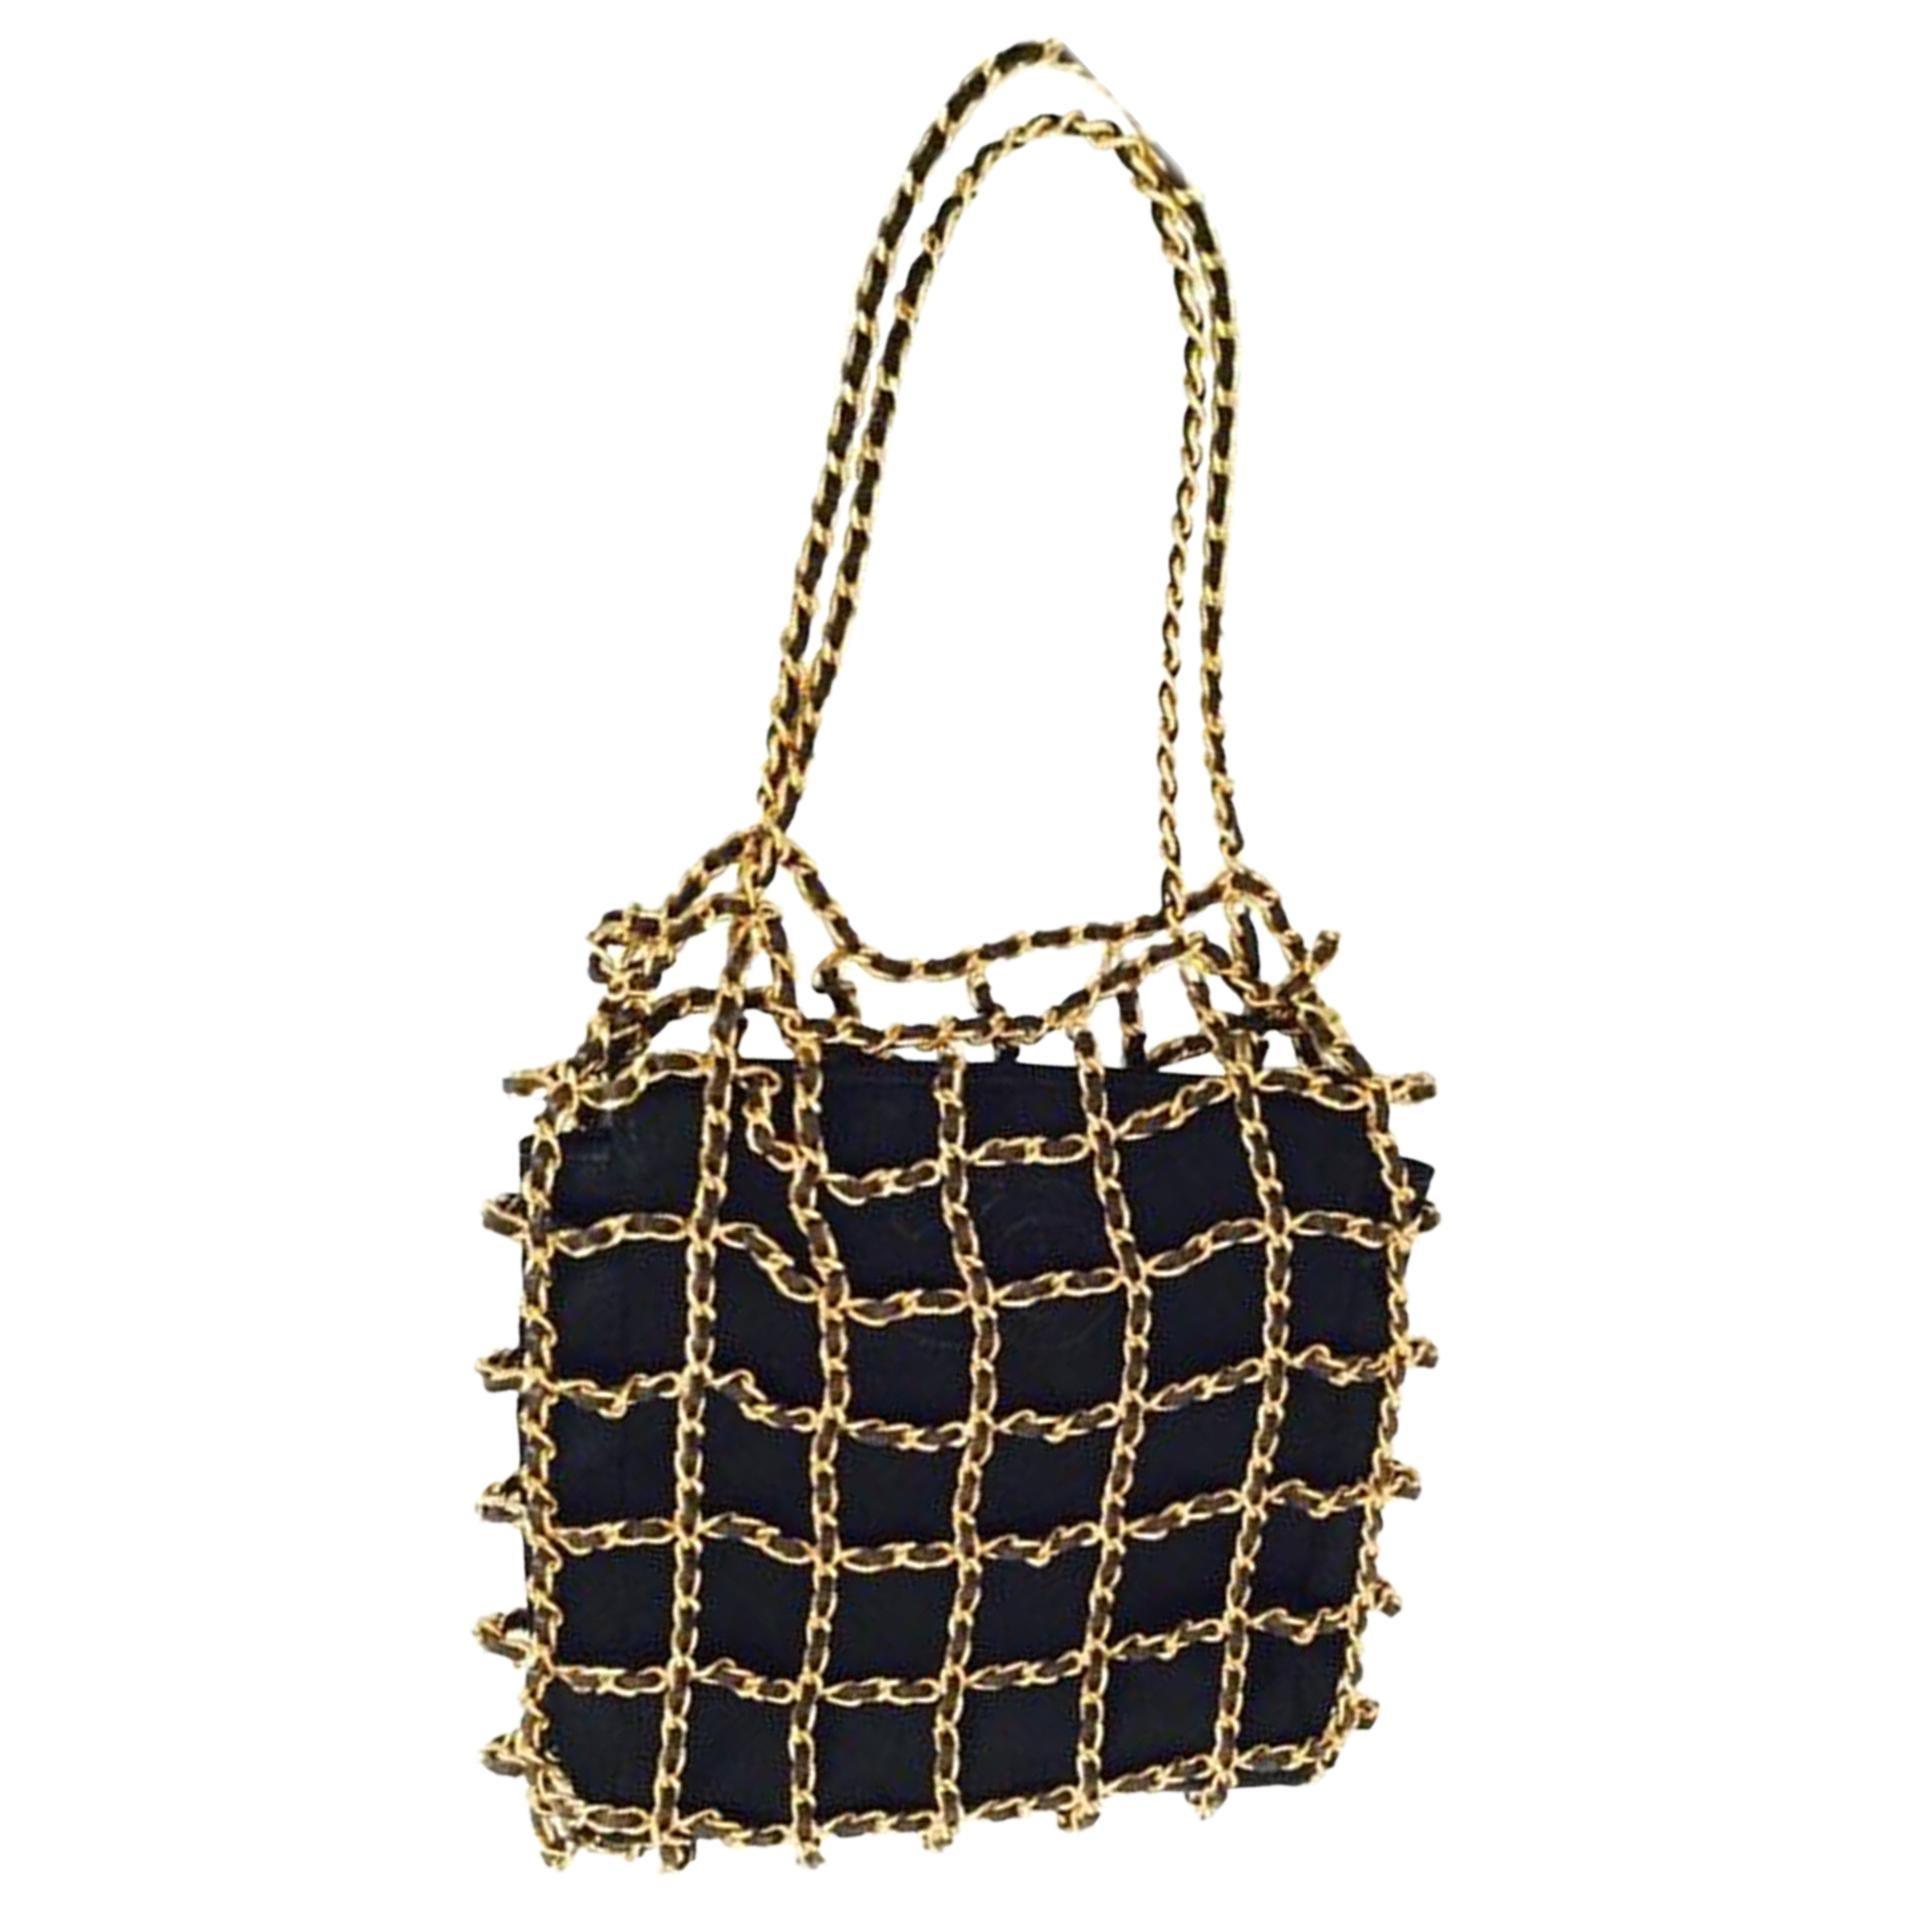 Chanel Minaudière Clutch Rare Vintage Micro Mini Woven Chain Black Satin Satchel